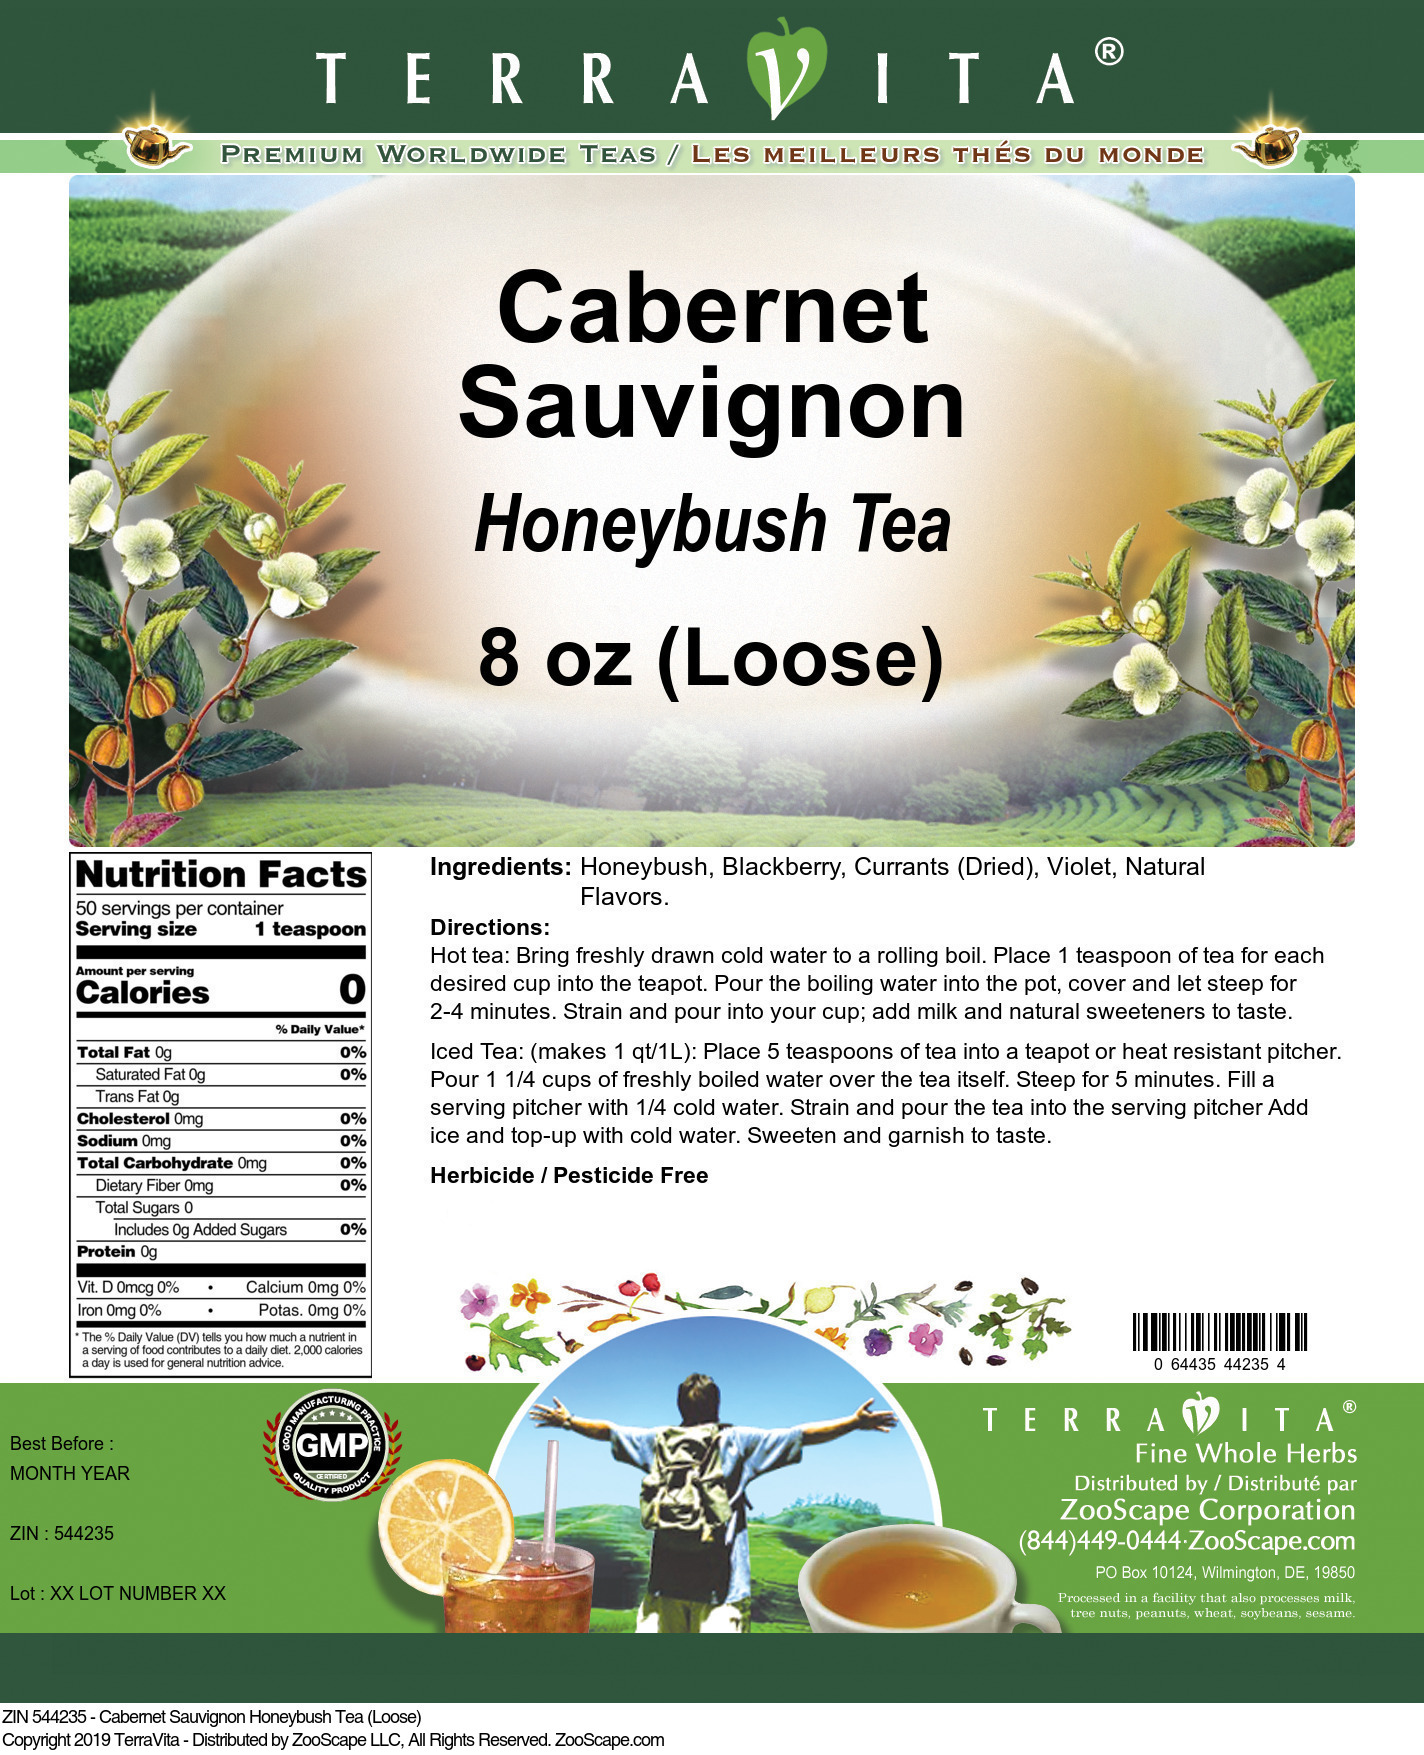 Cabernet Sauvignon Honeybush Tea (Loose)